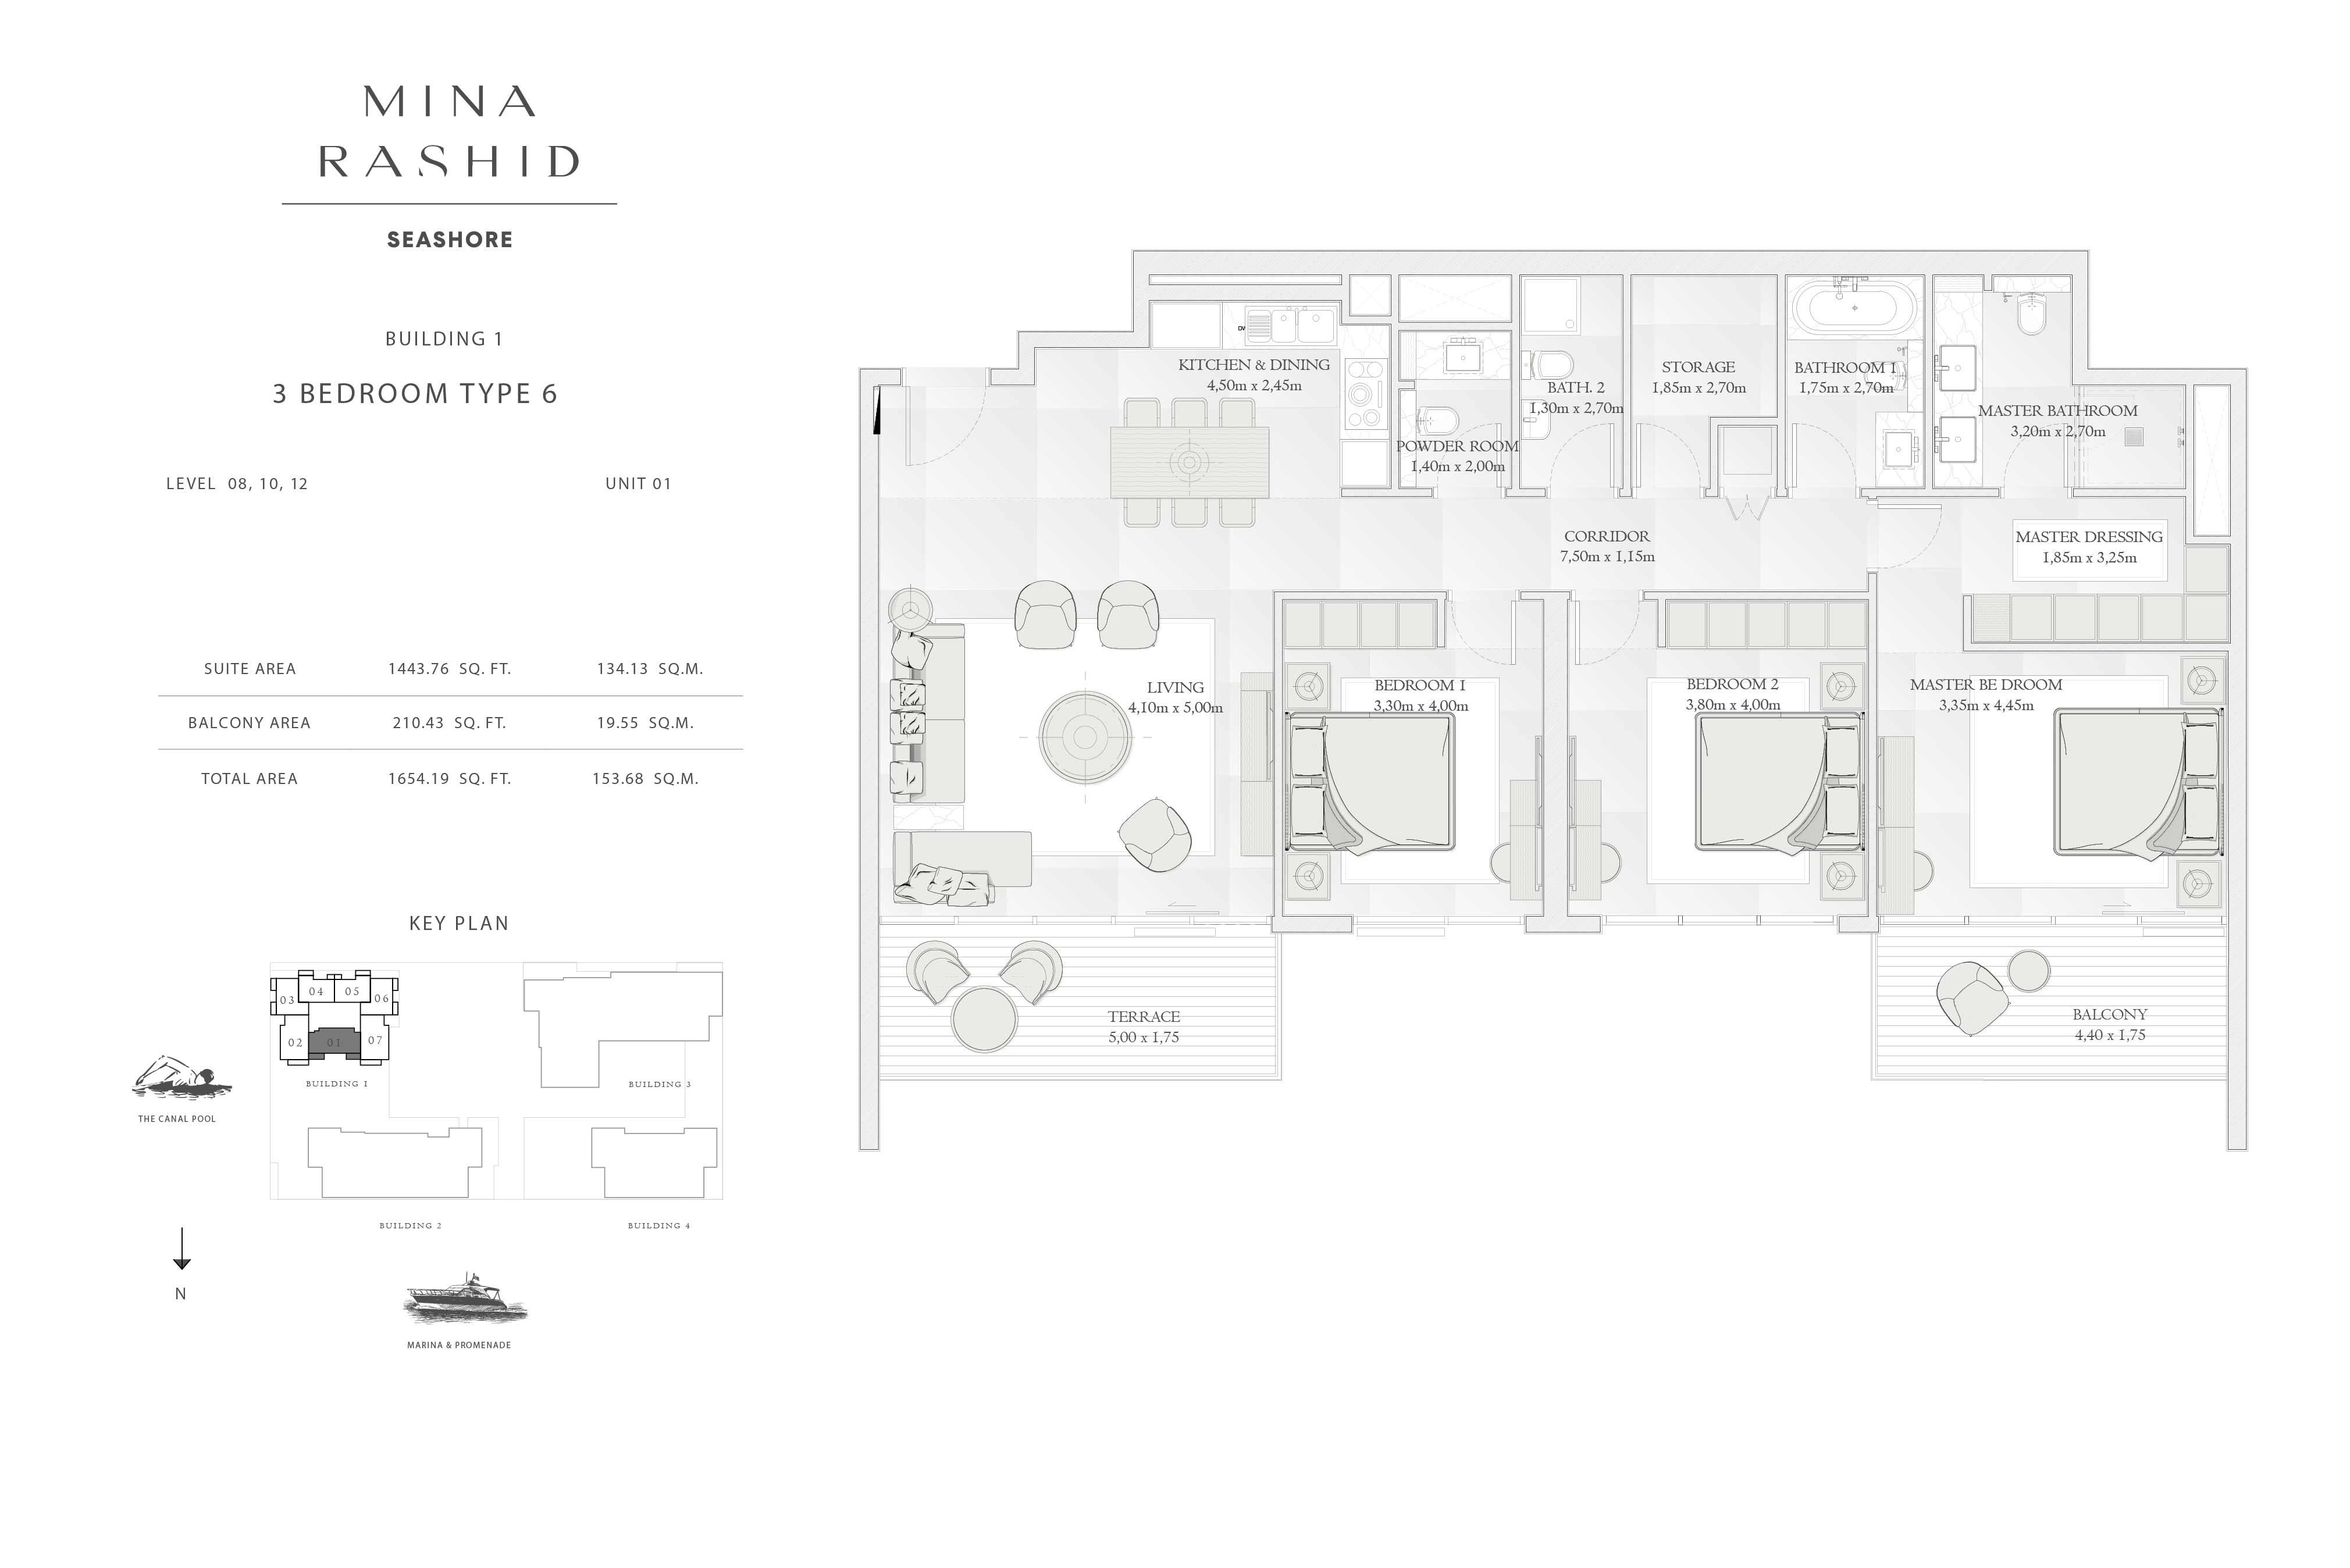 Building-1, 3-Bedroom Type-6, Size-1654-Sq-Ft